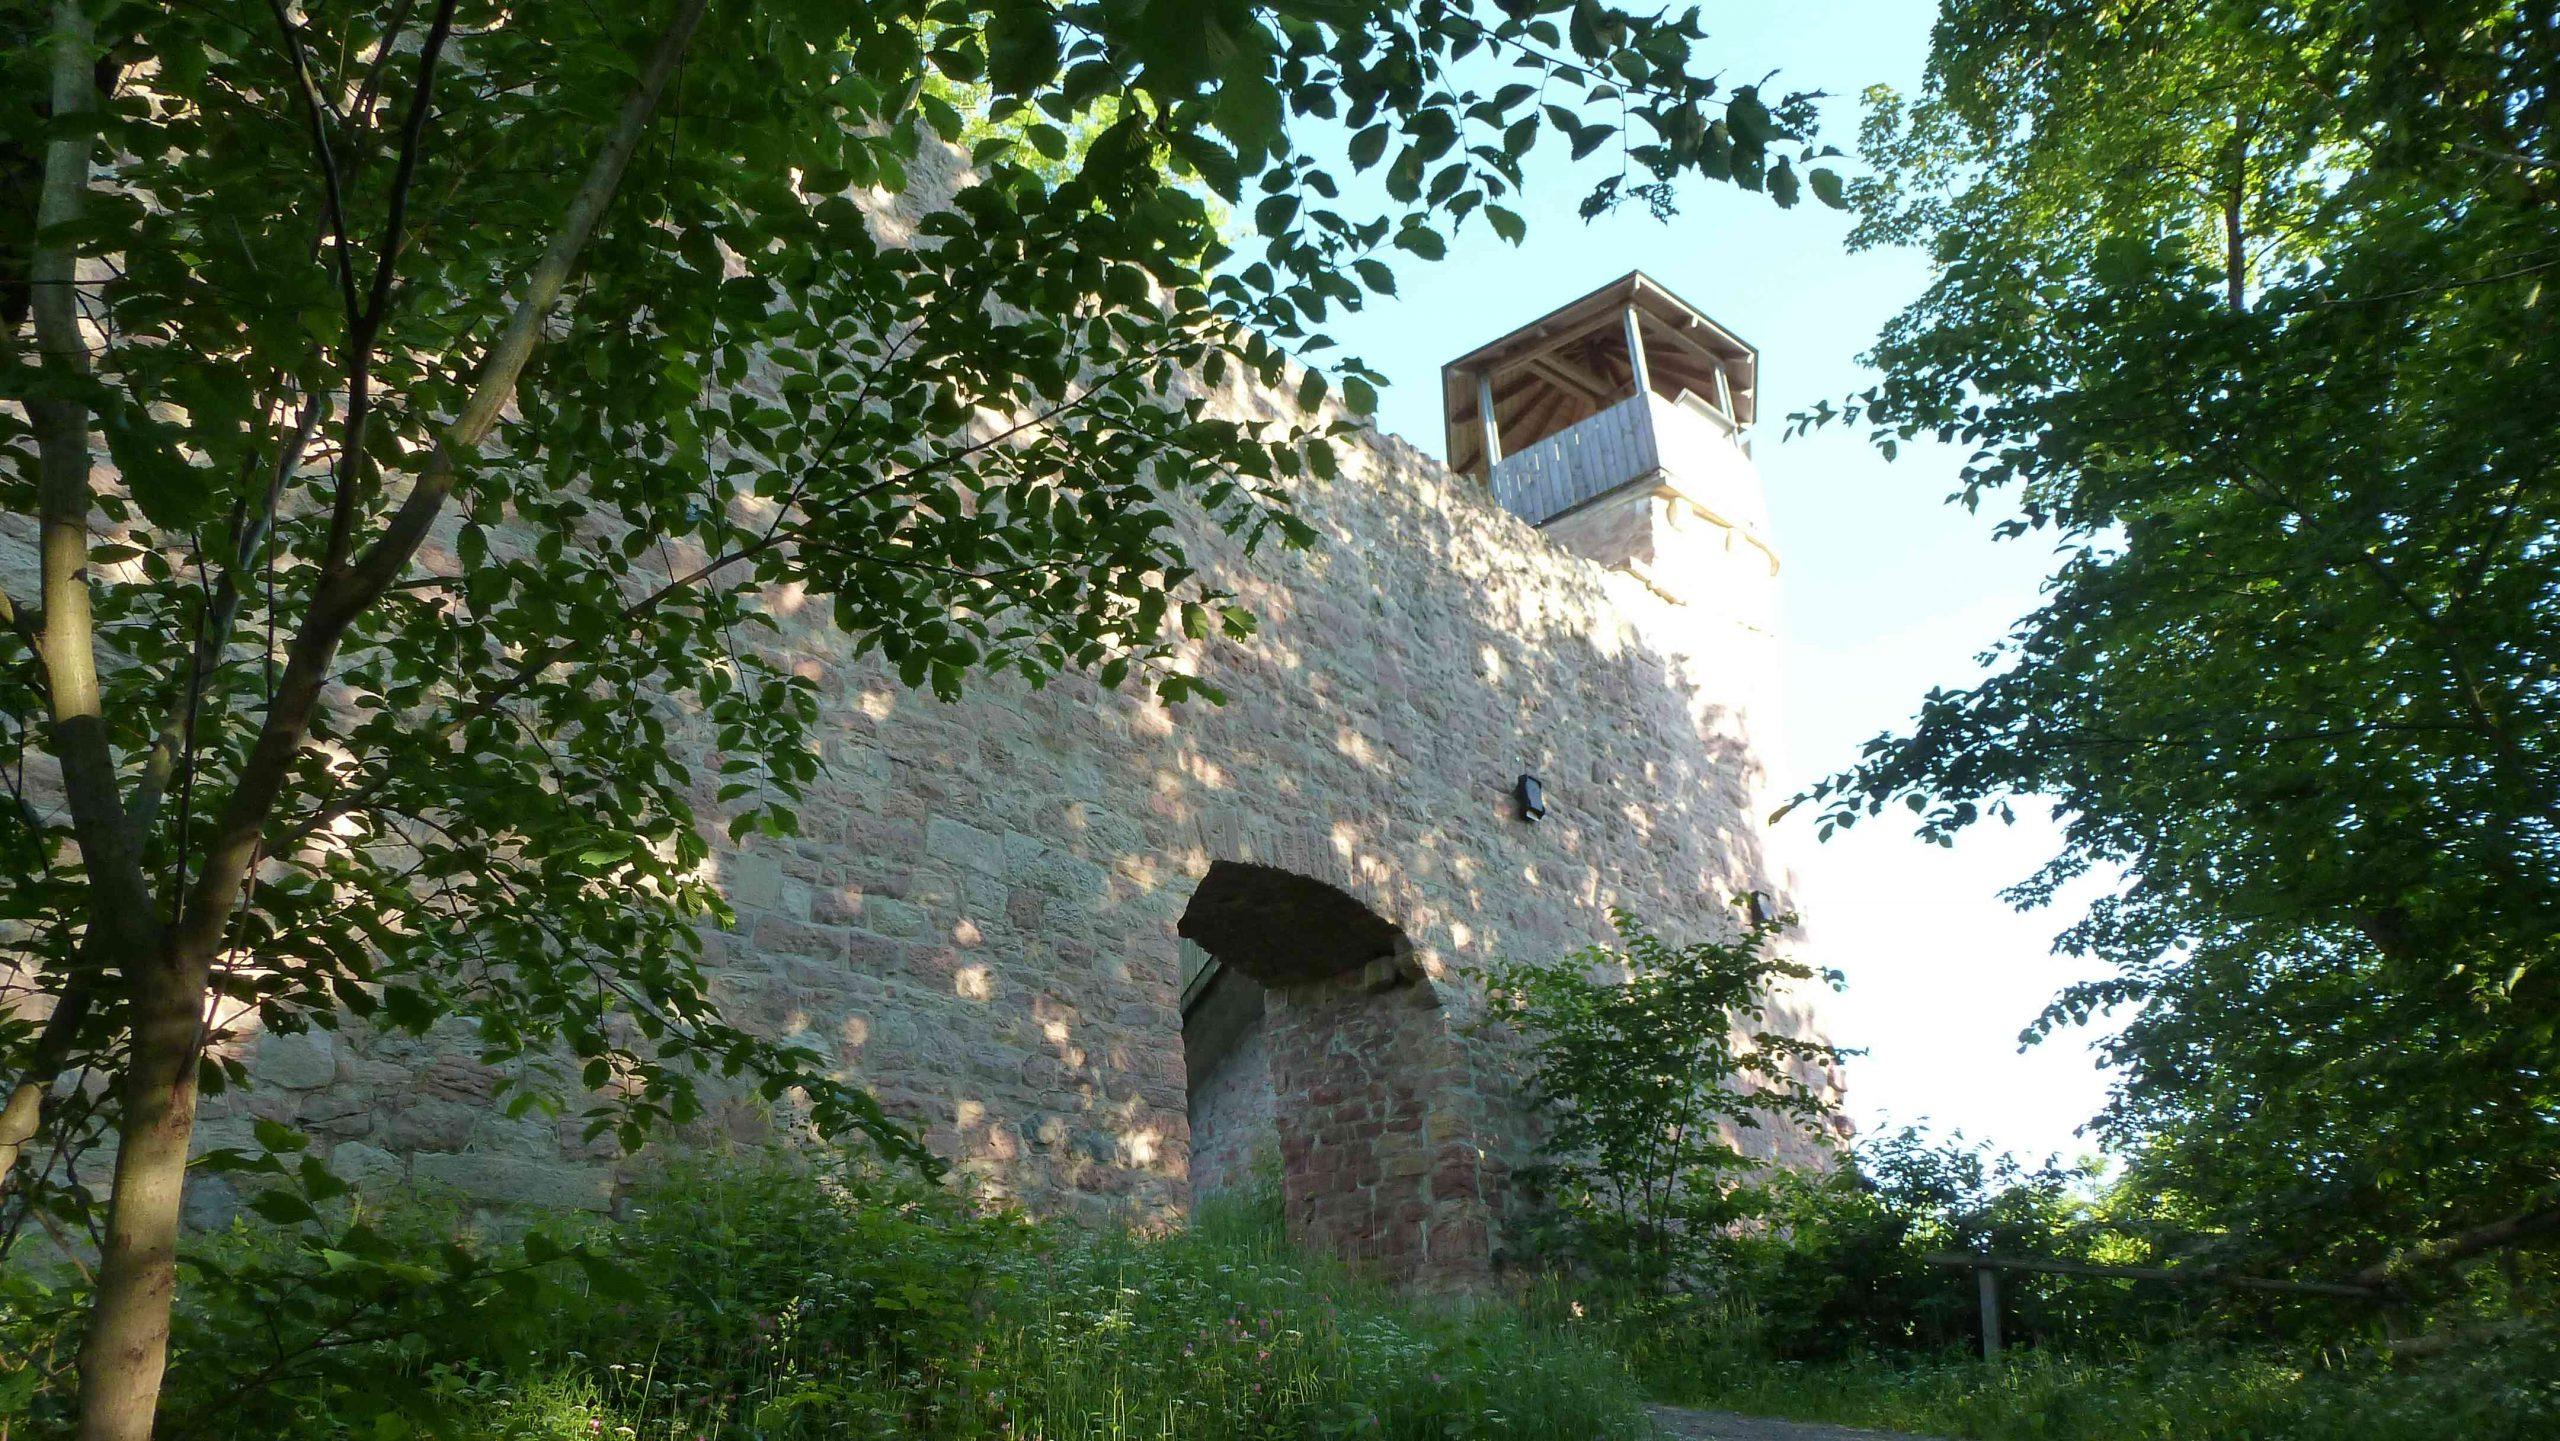 Auersburg, Lkr. Fulda